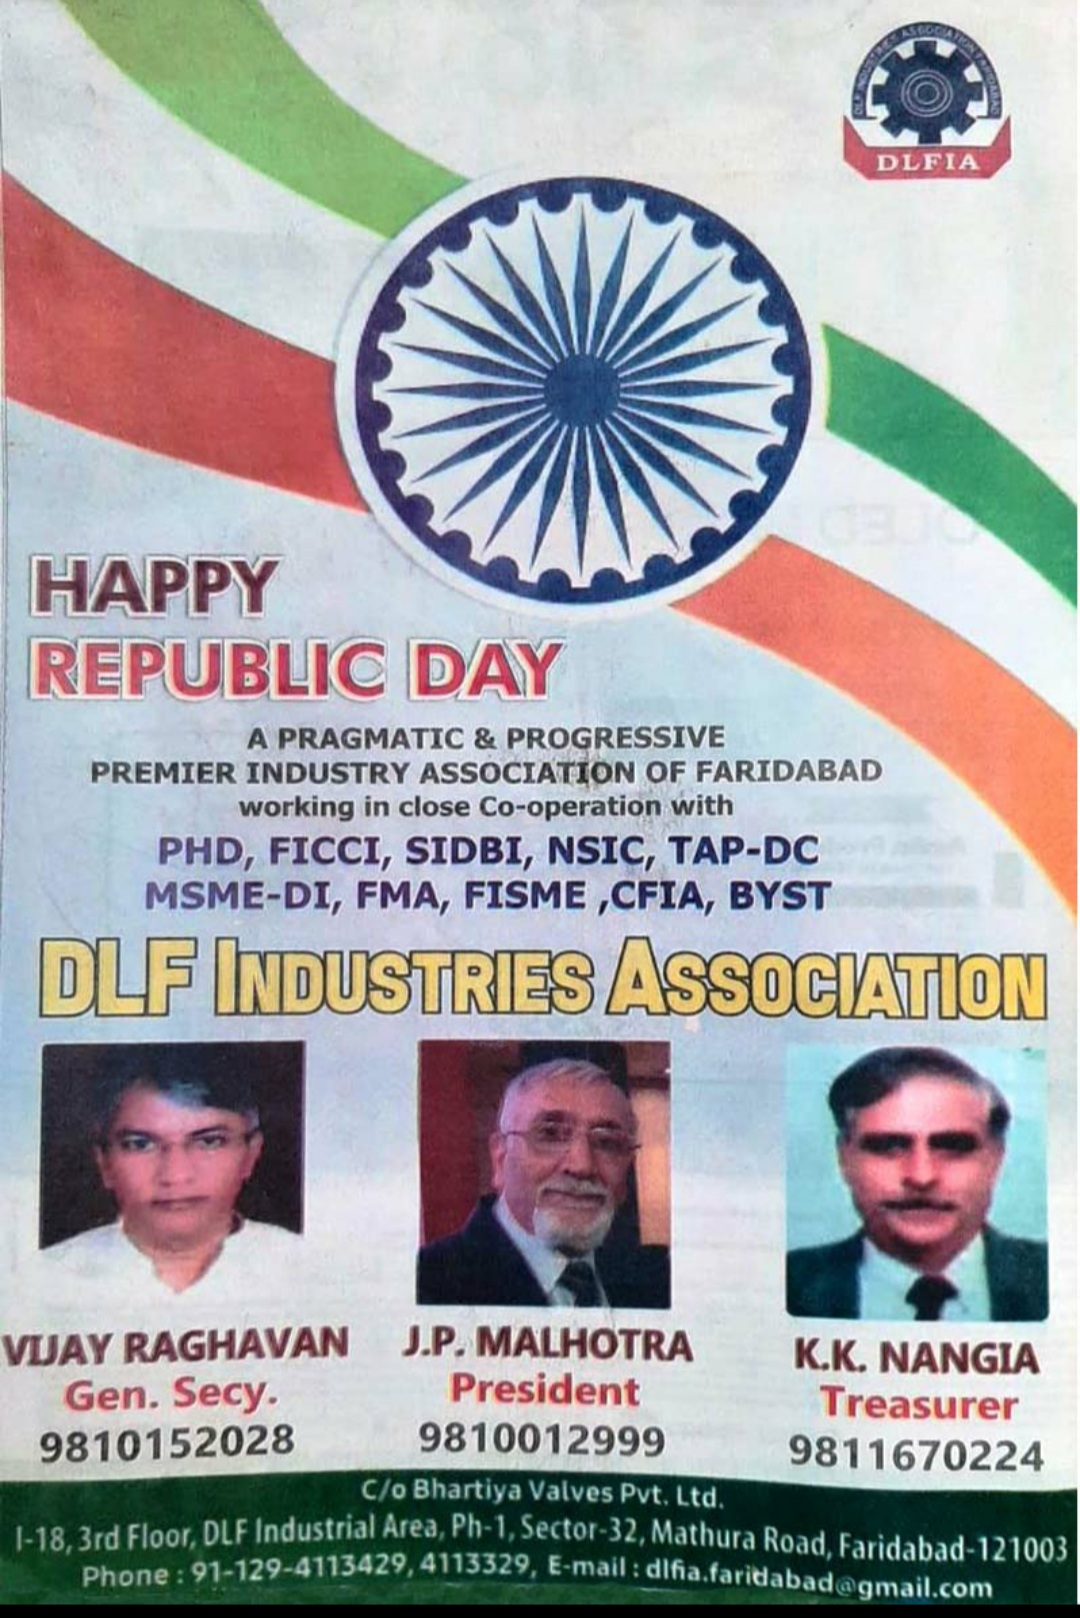 Repubic day wish by dlf assocation faridabad